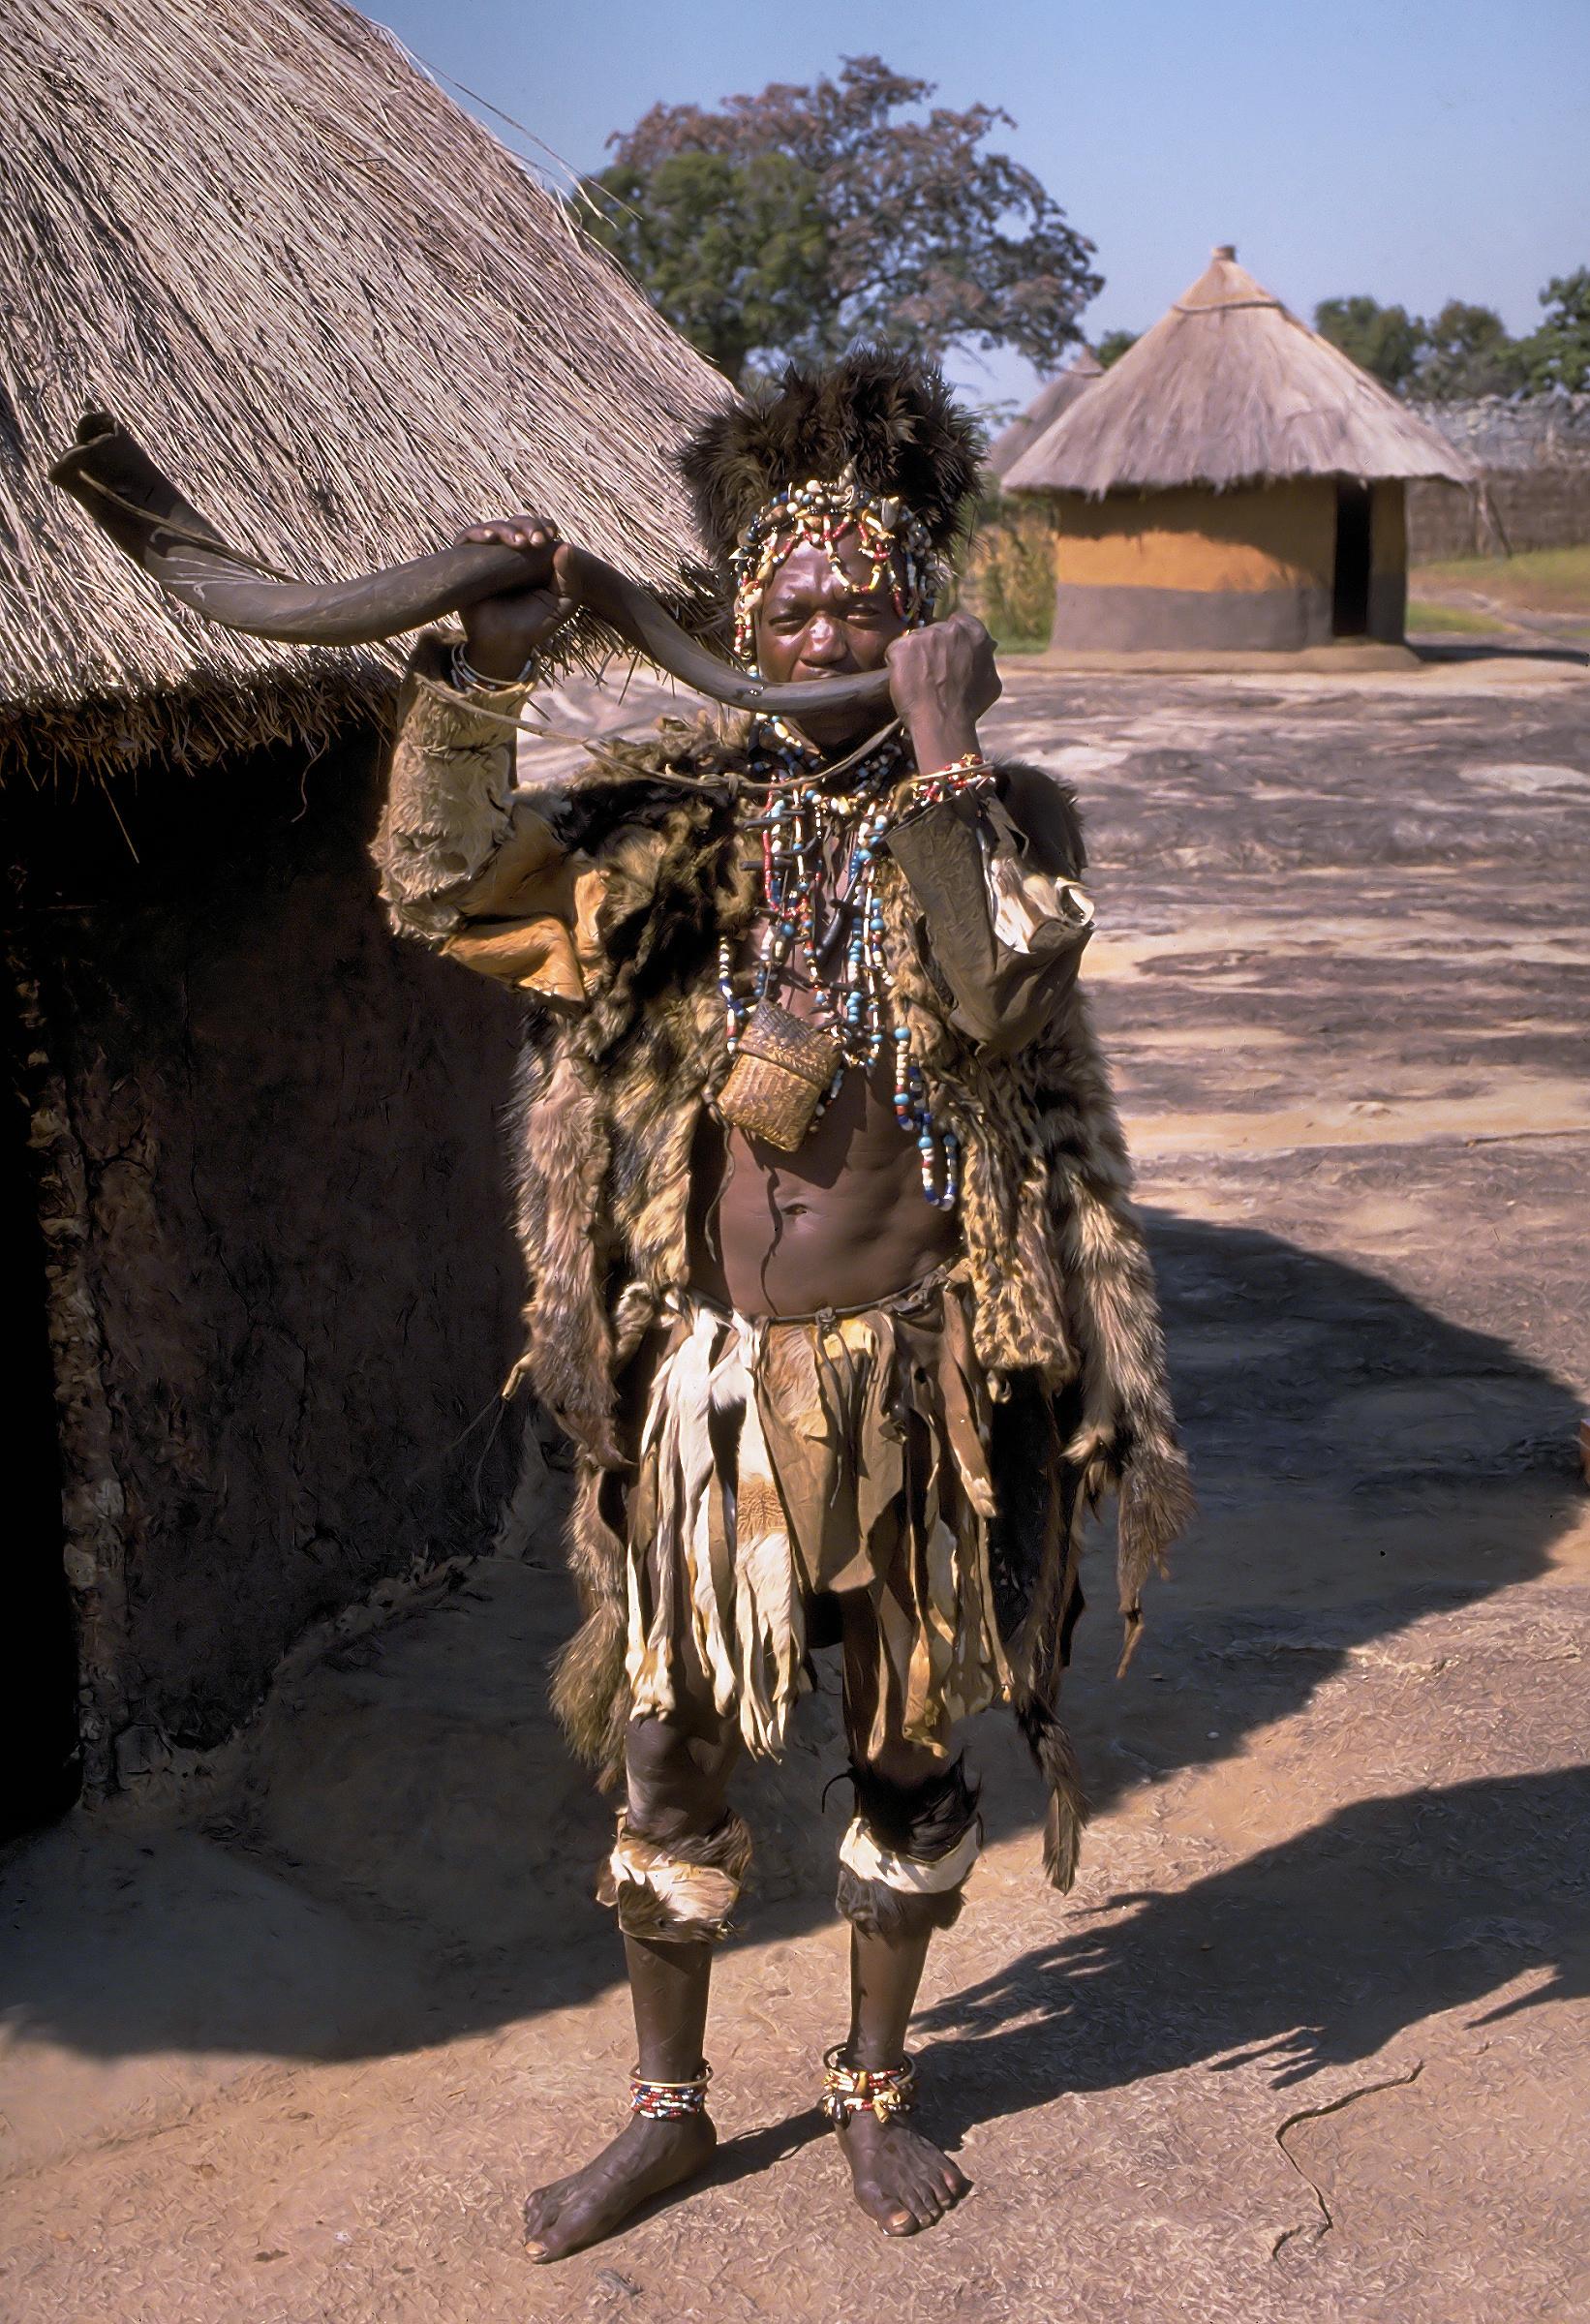 File:Shona witch doctor (Zimbabwe).jpg - Wikipedia